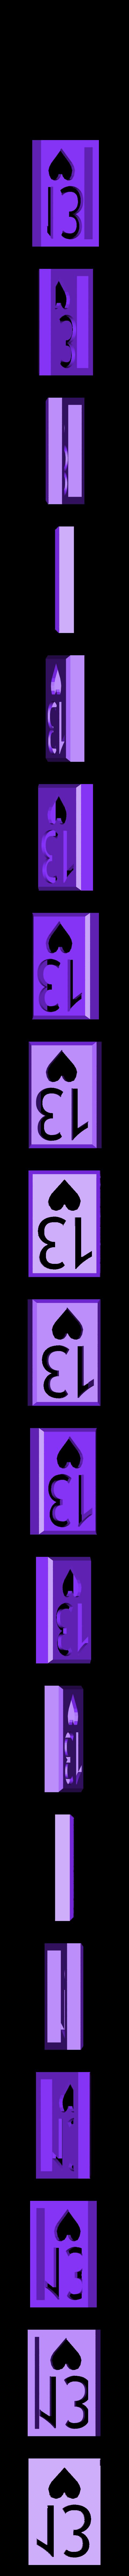 BlockHearts13.stl Download STL file Playing Card Tiles • Object to 3D print, Jinja